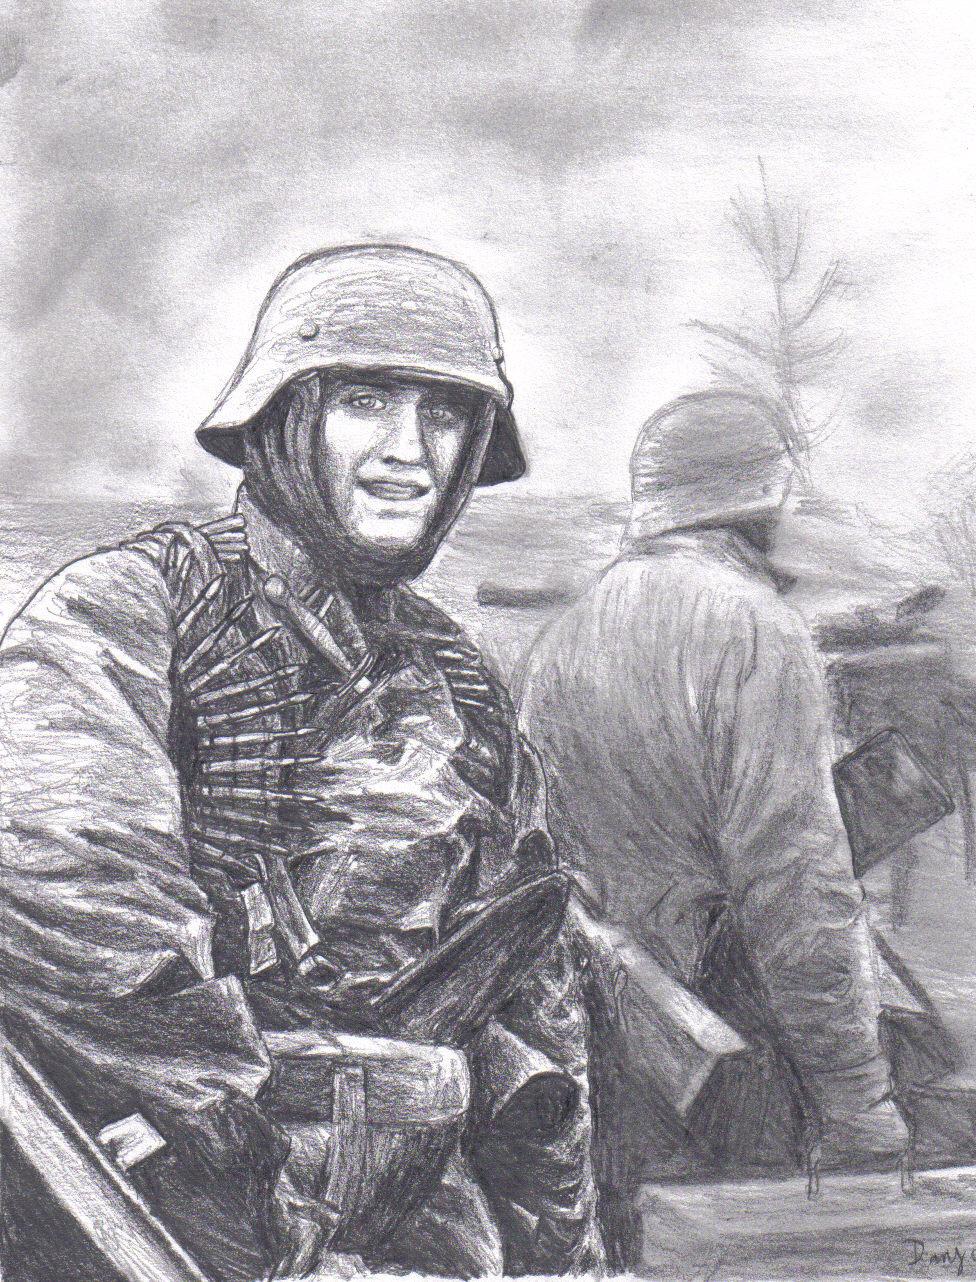 Drawn wars ww2 soldier German on by WW2 by